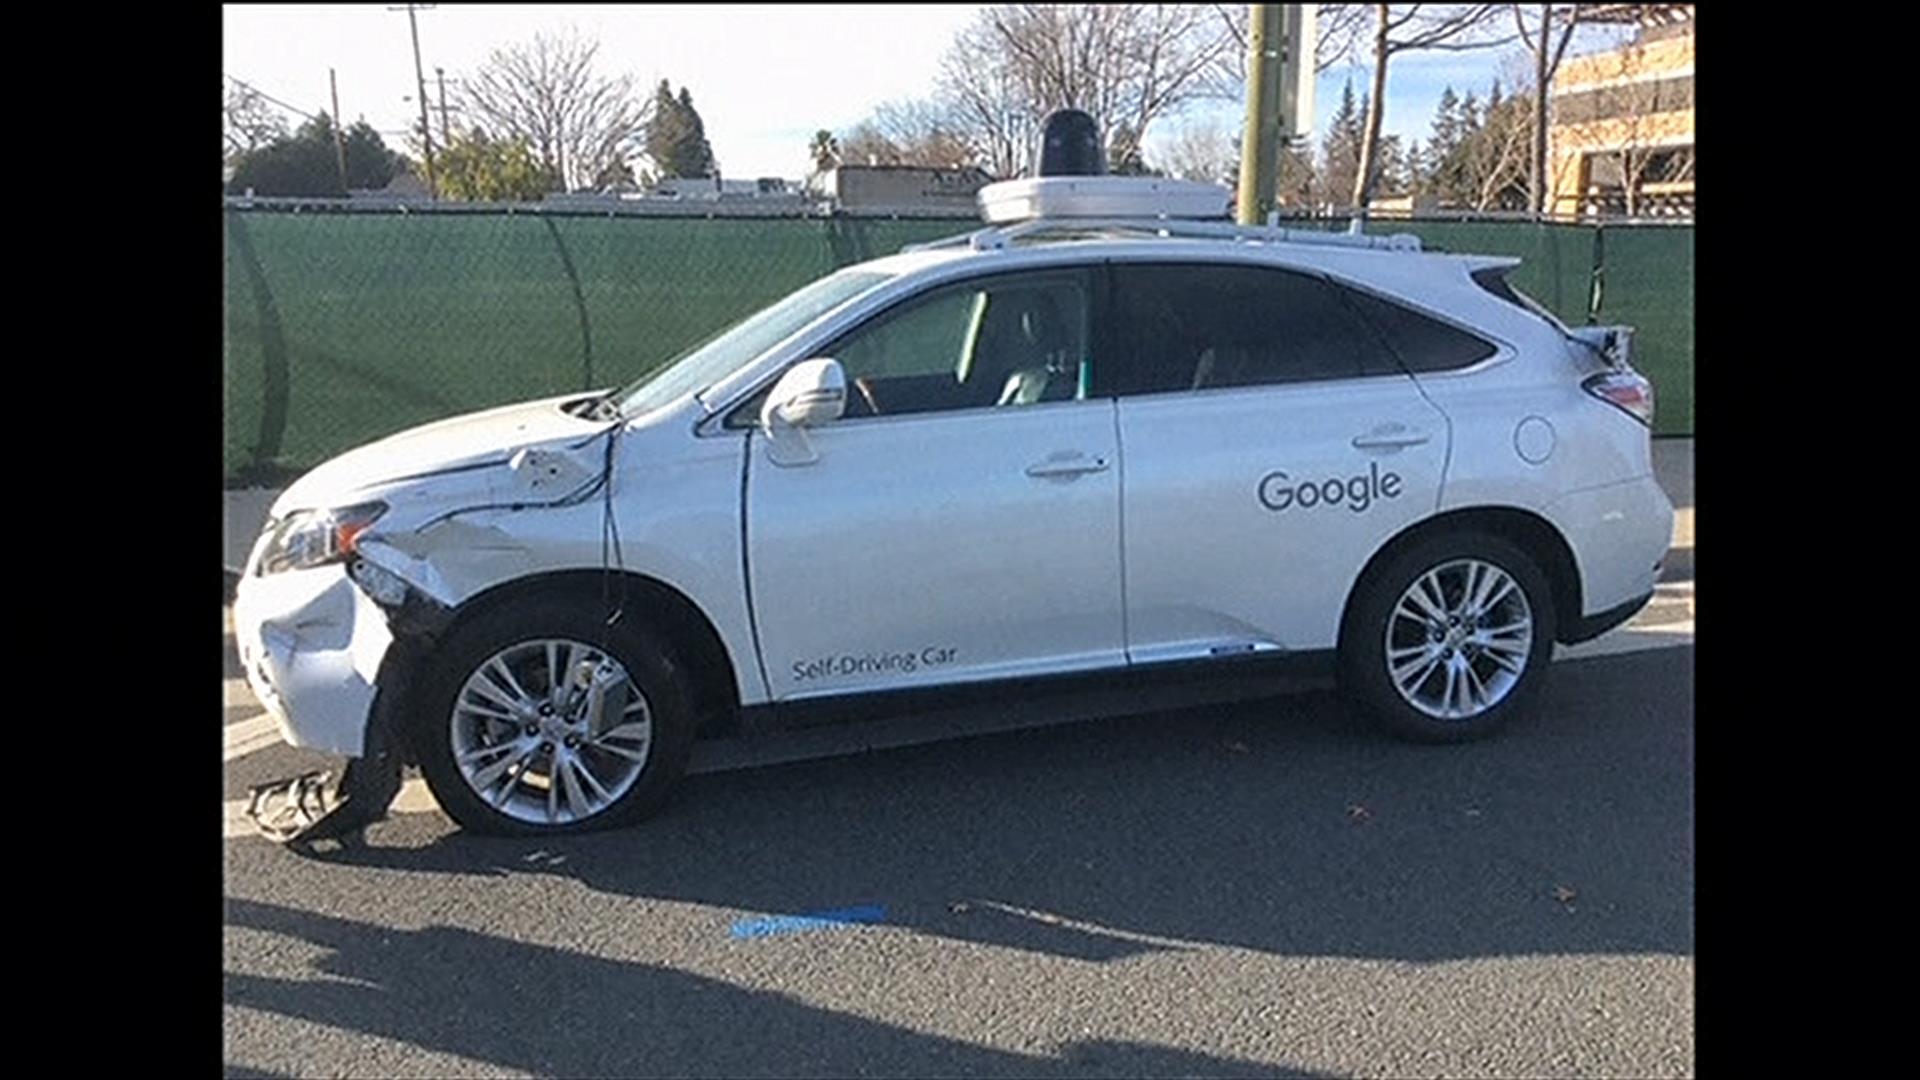 Google Self Driving Suv Hits Bus Nbc News